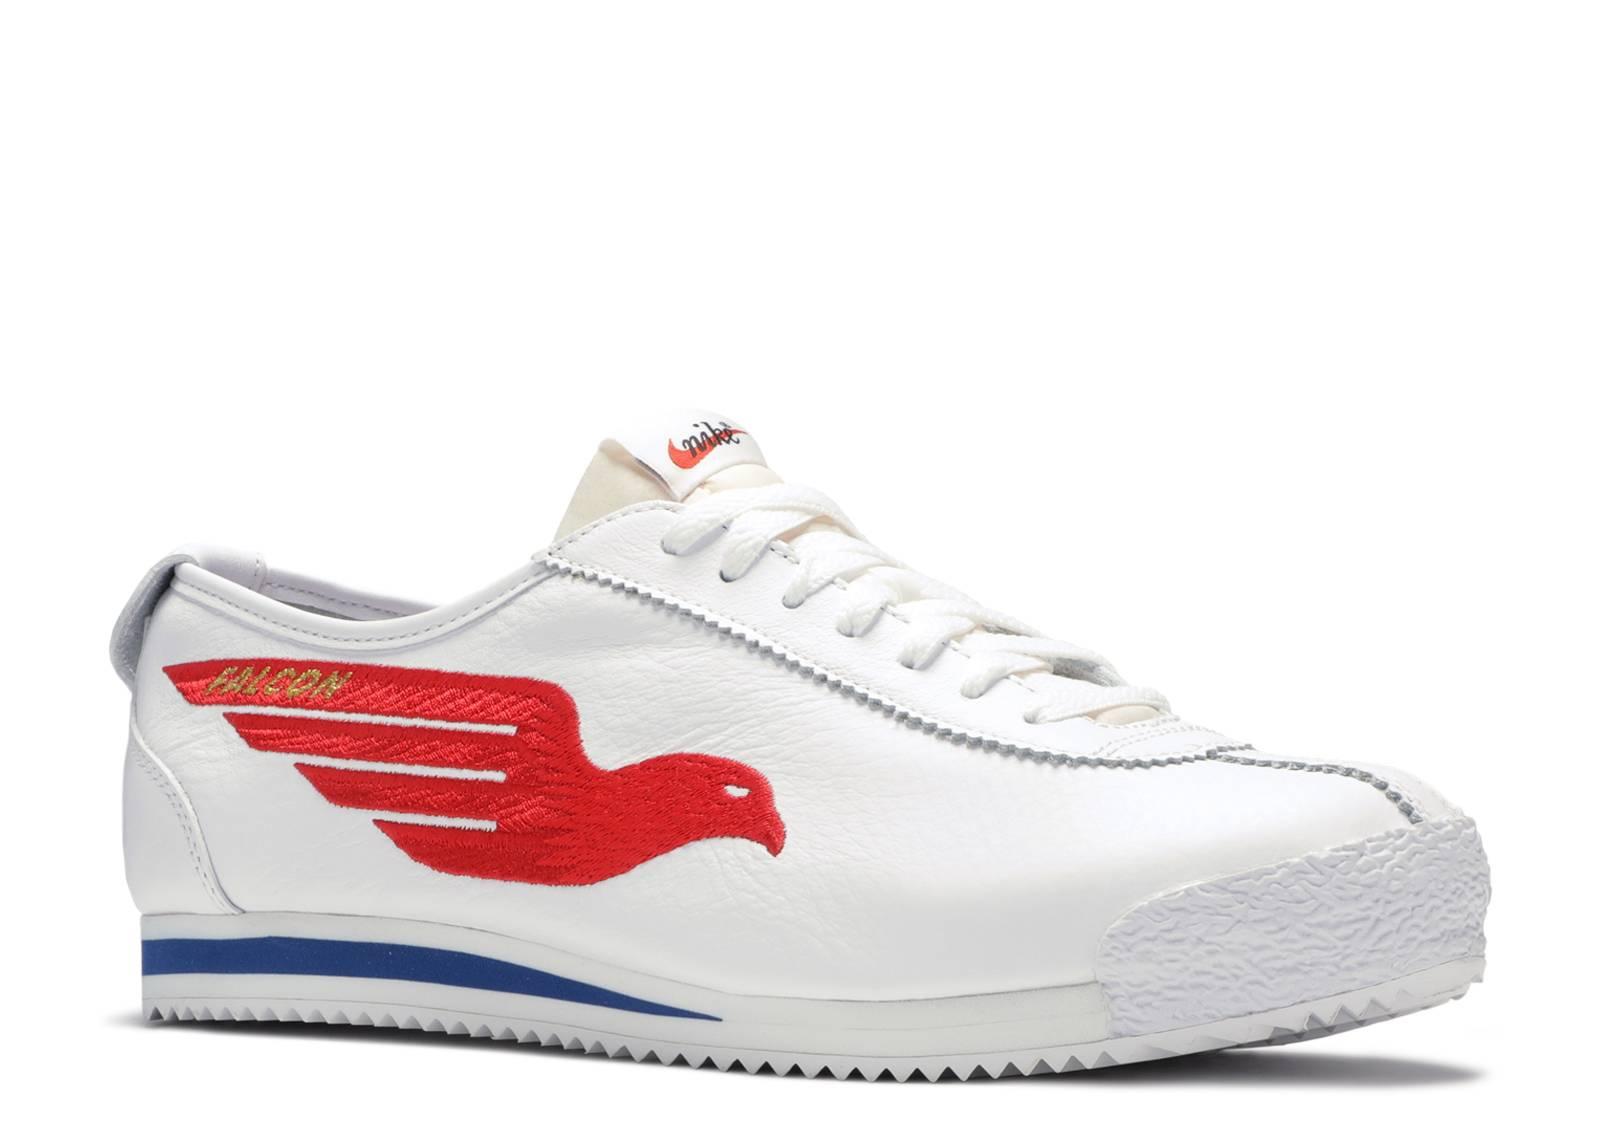 impulso Colapso Elección  Classic Cortez '72 QS 'Shoe Dog Pack Falcon' - Nike - CJ2586 102 -  white/varsity red-game royal | Flight Club